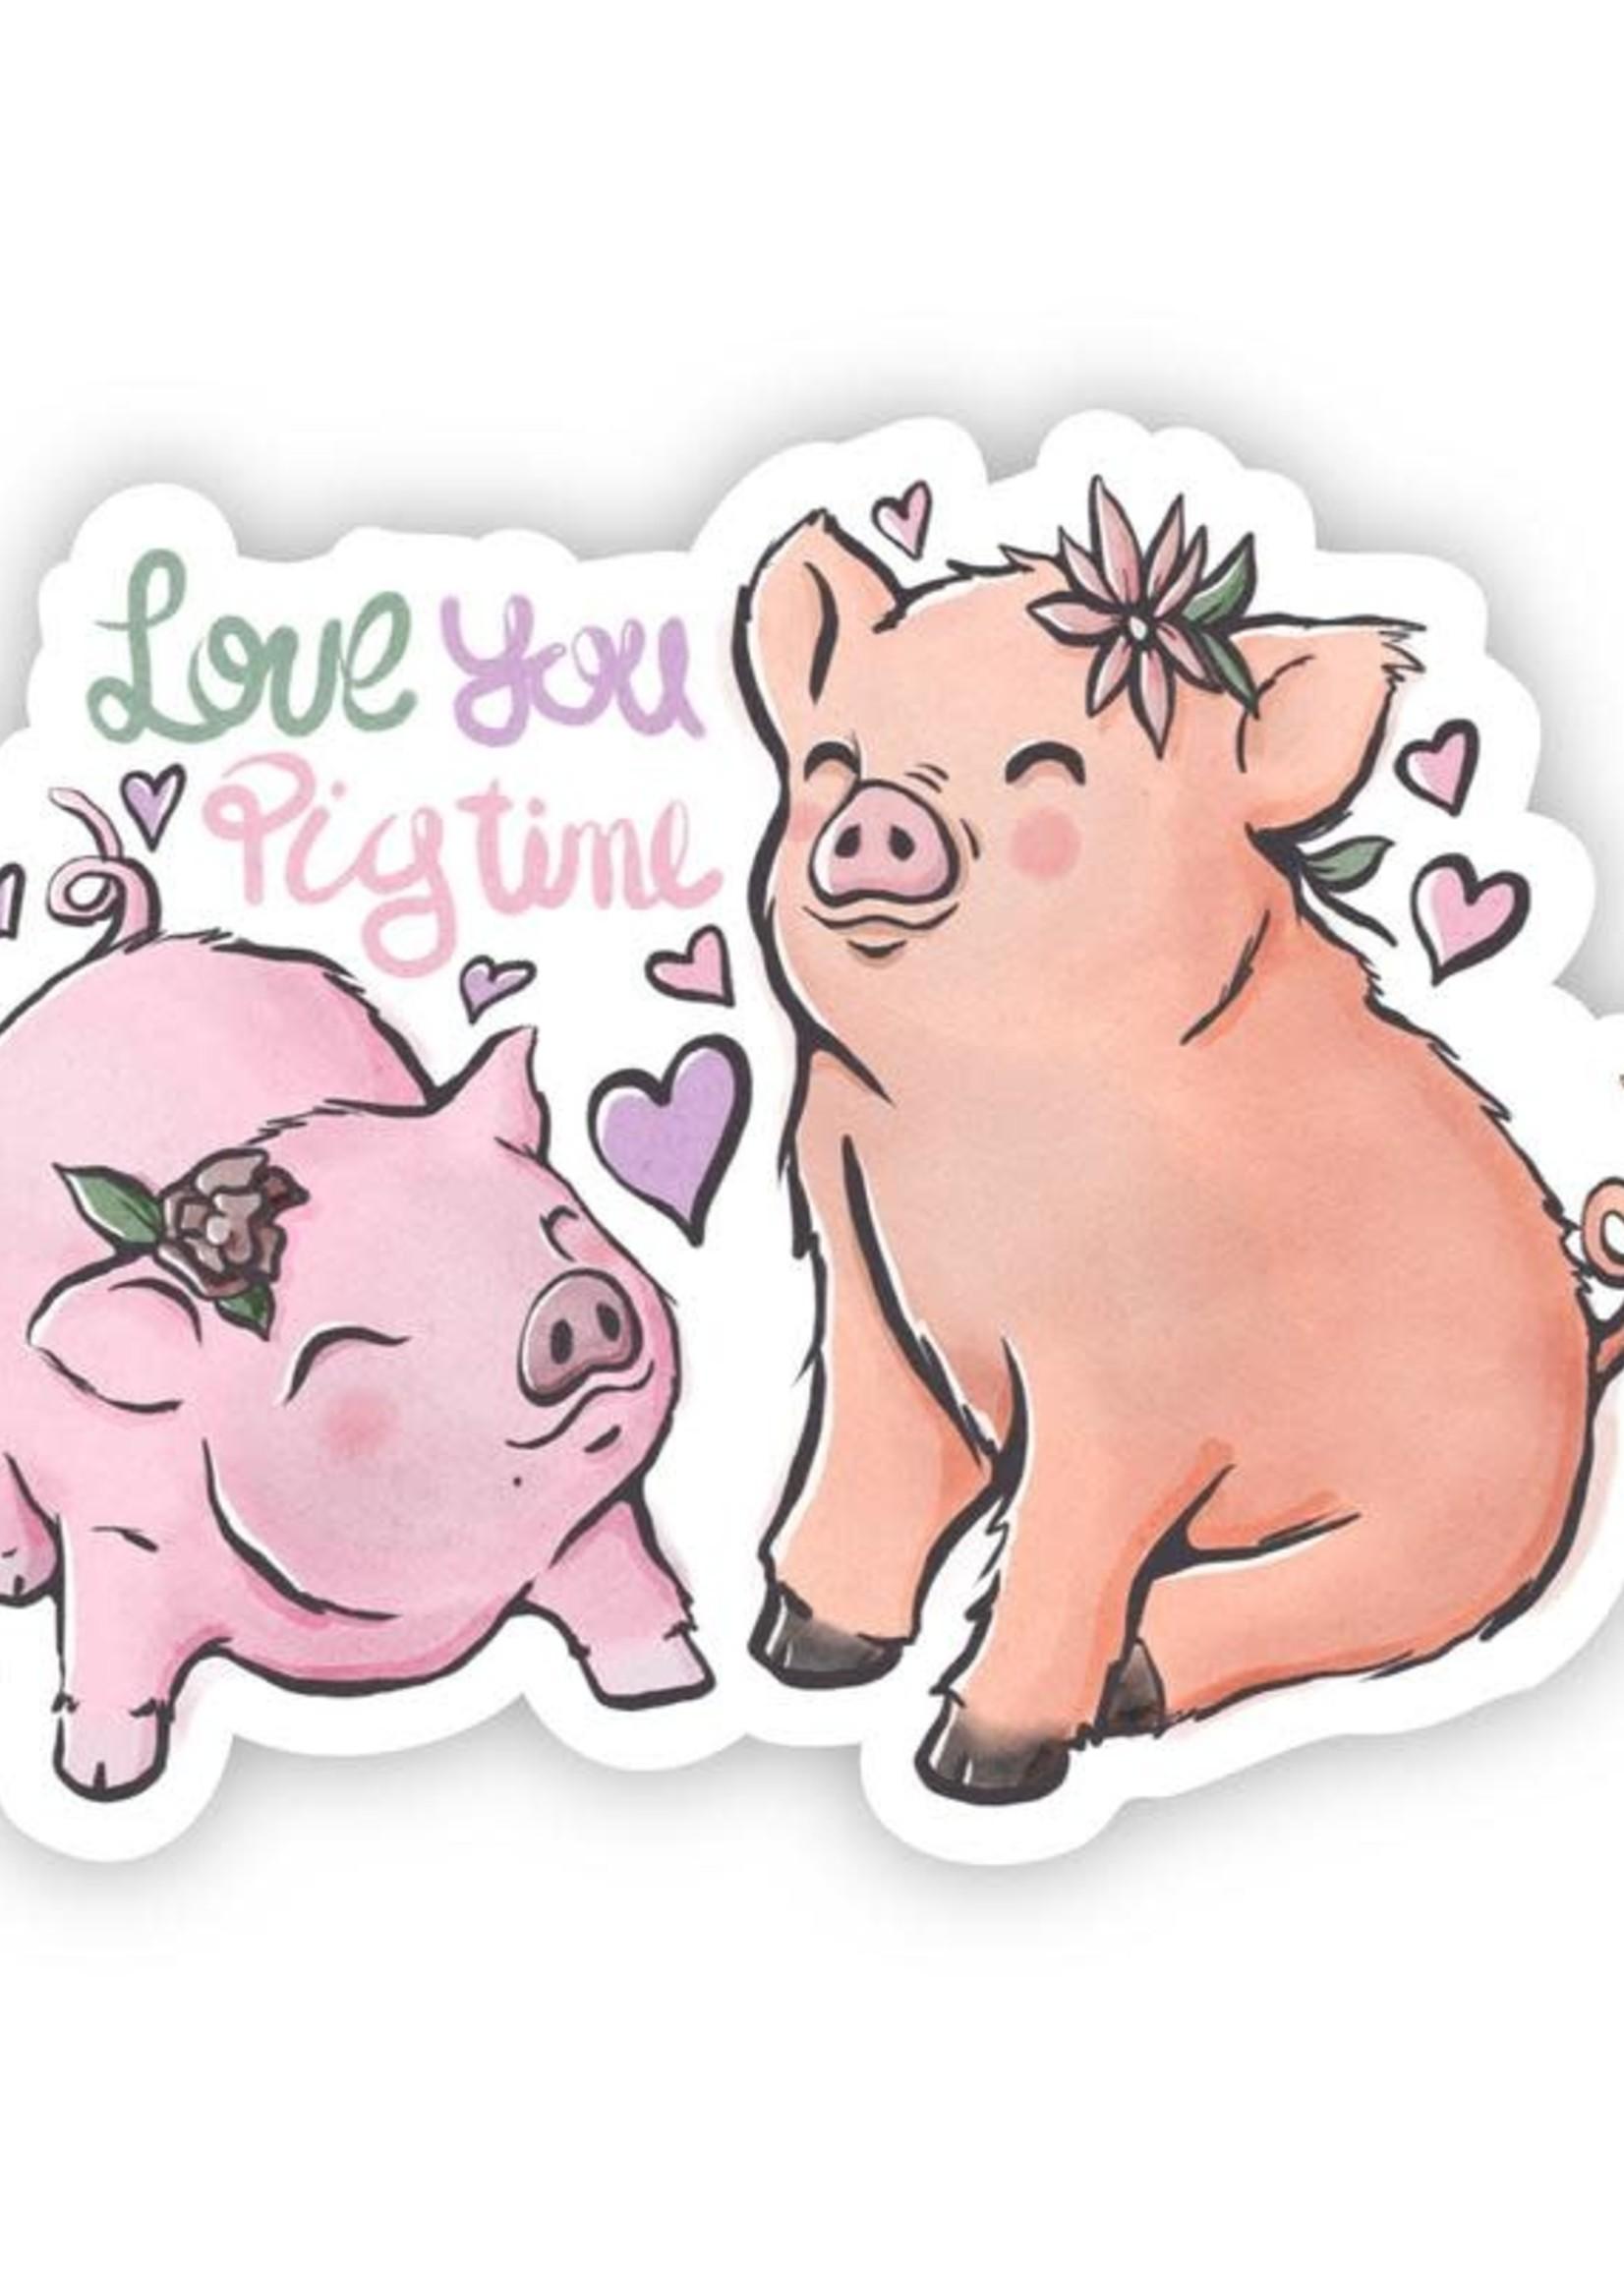 Big Moods Love You Pig Time Sticker